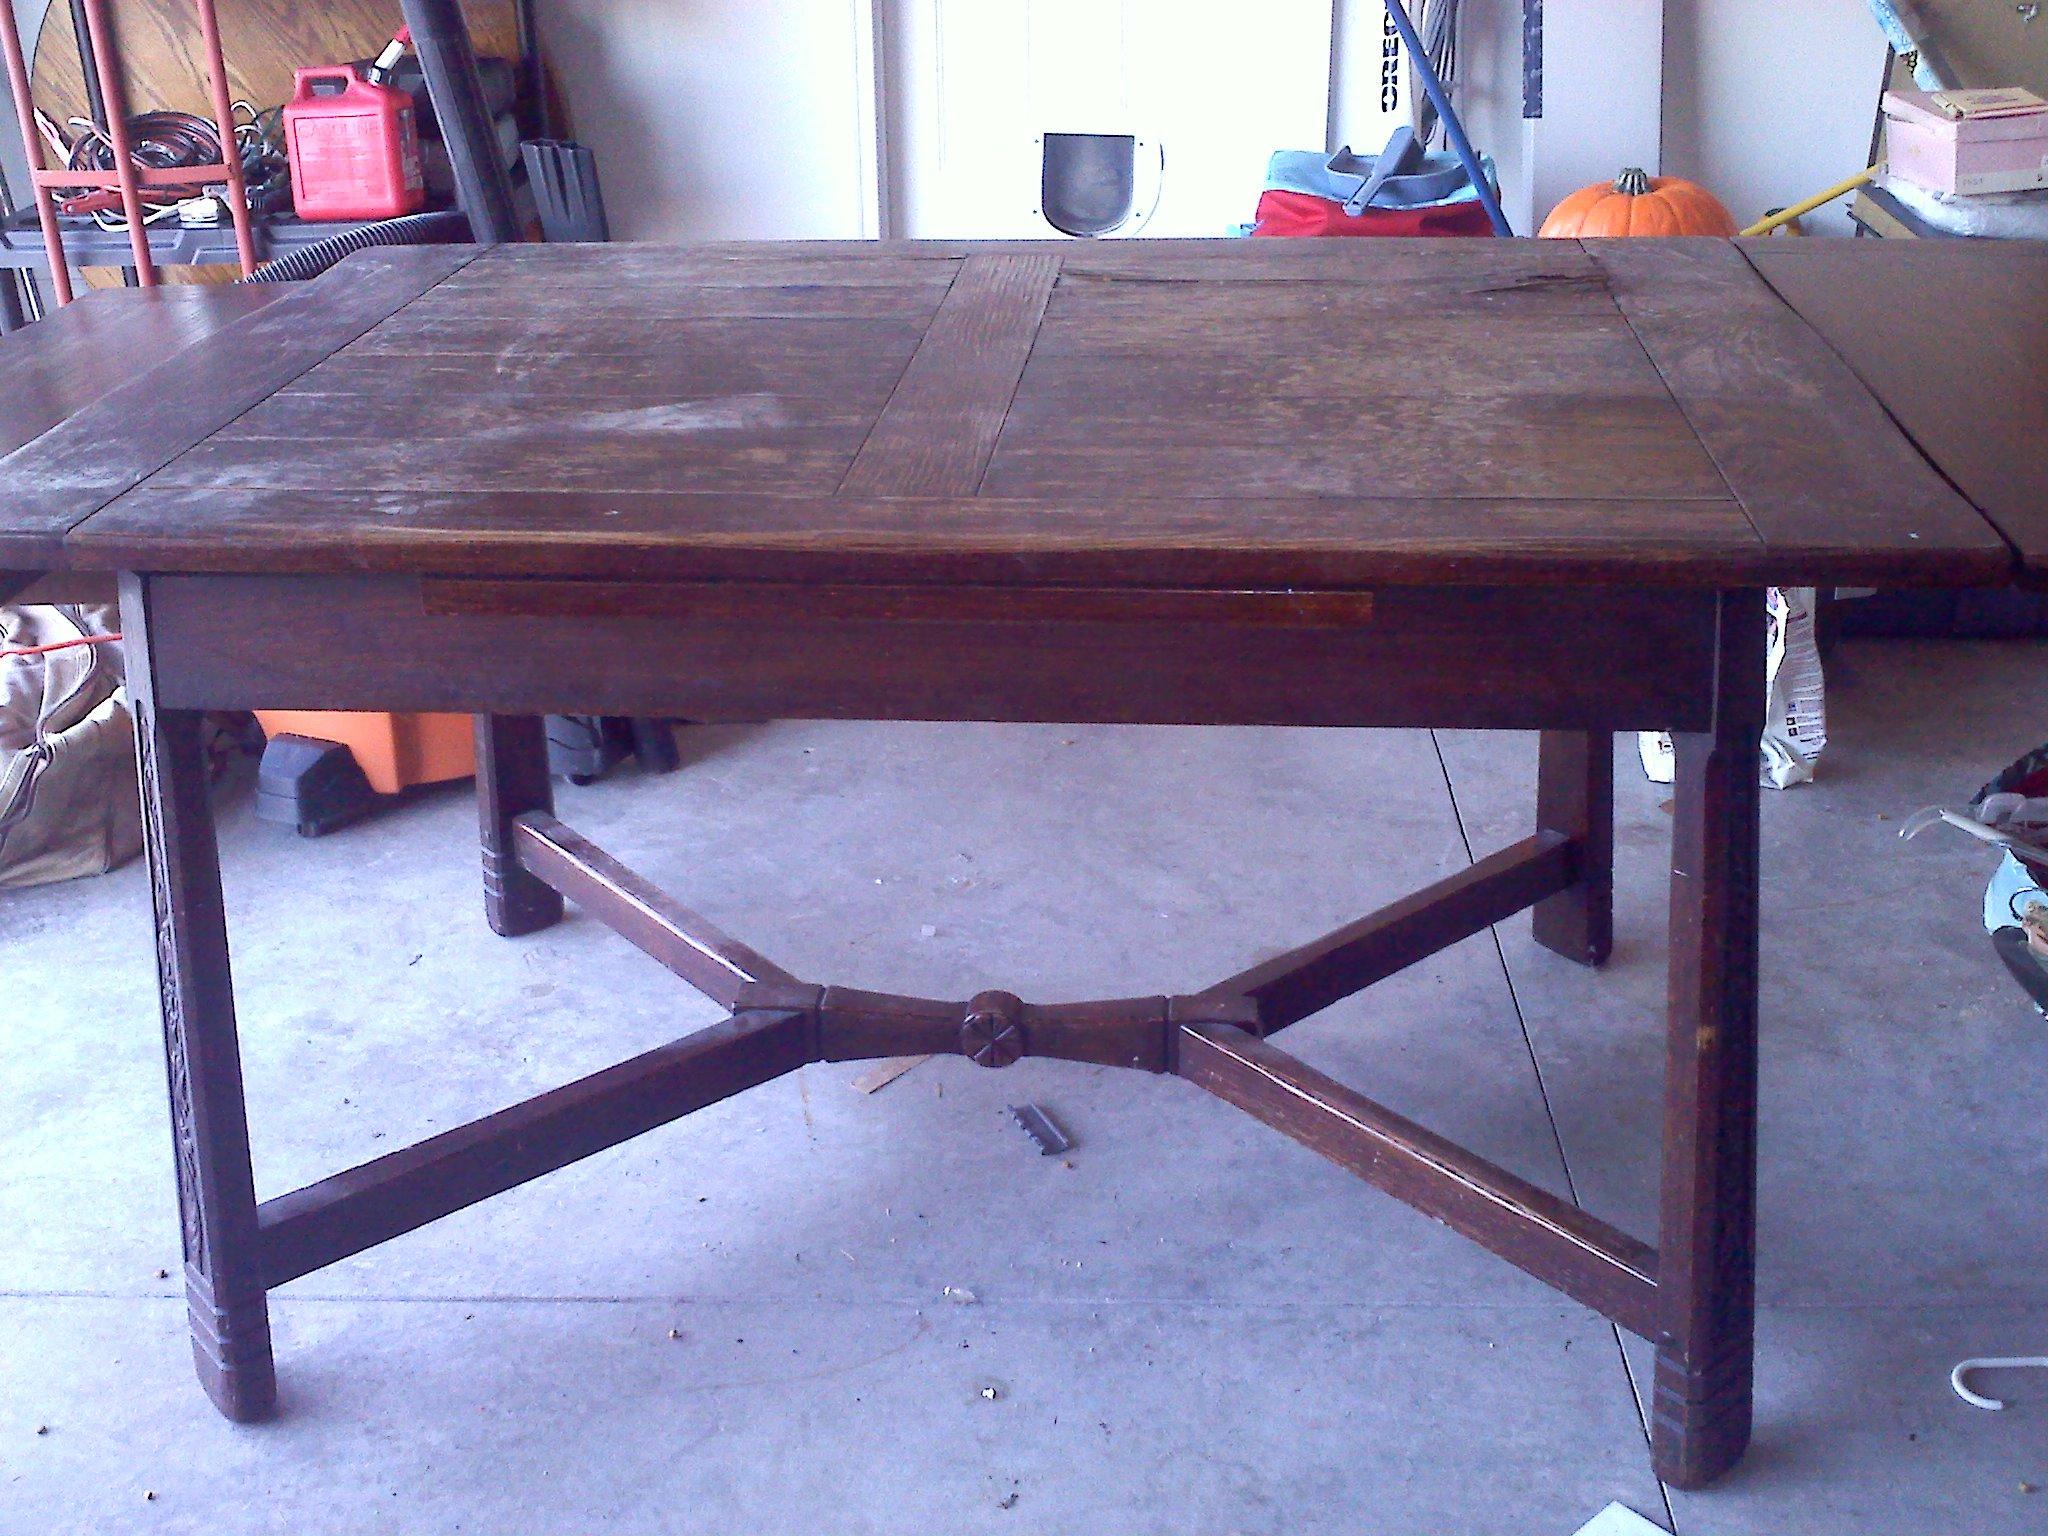 1860 Flint & Horner Expanding Dining Room Table For Sale